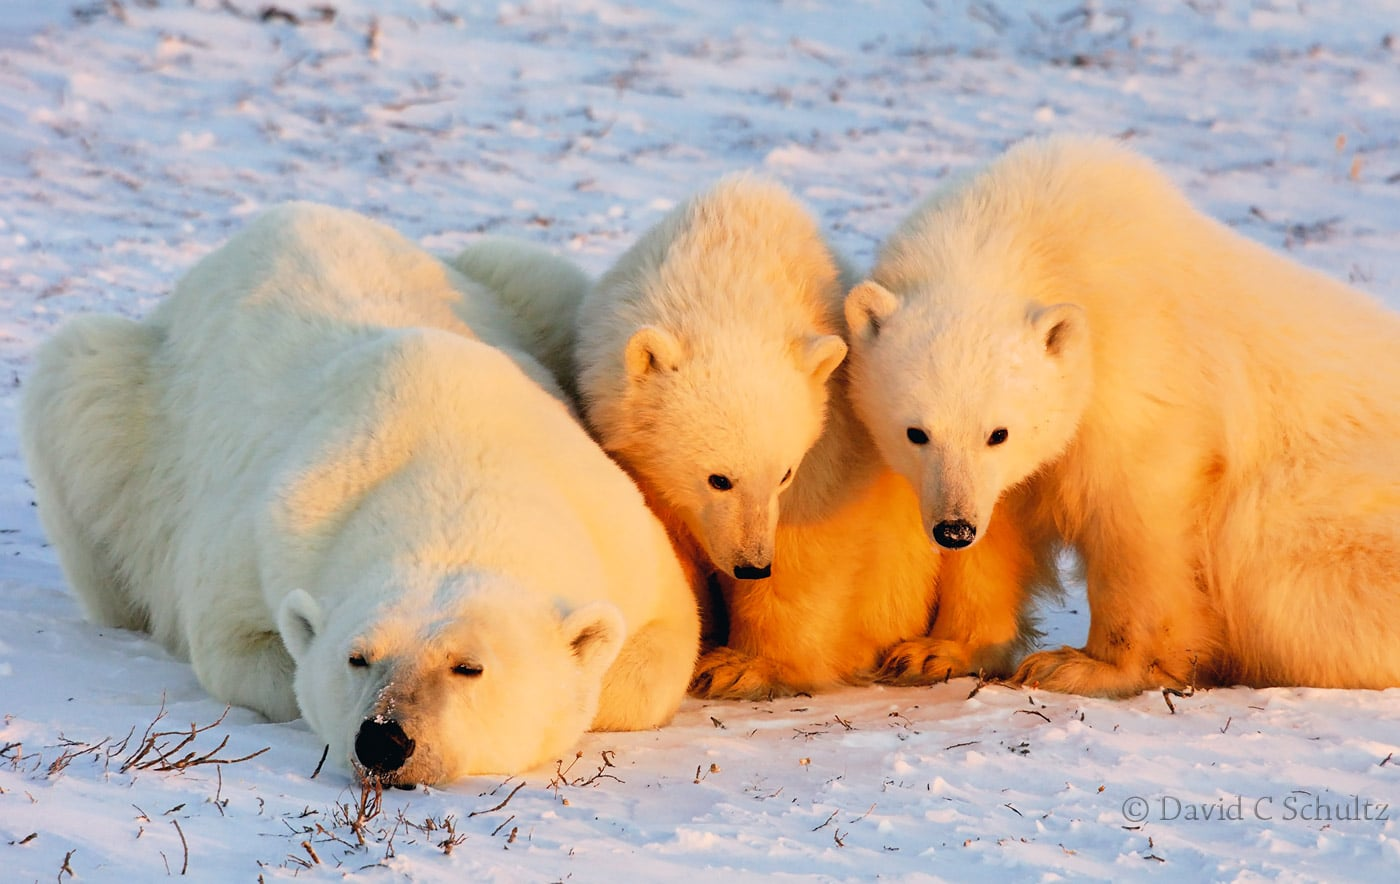 Polar bear cubs, Canada - Image #168-884